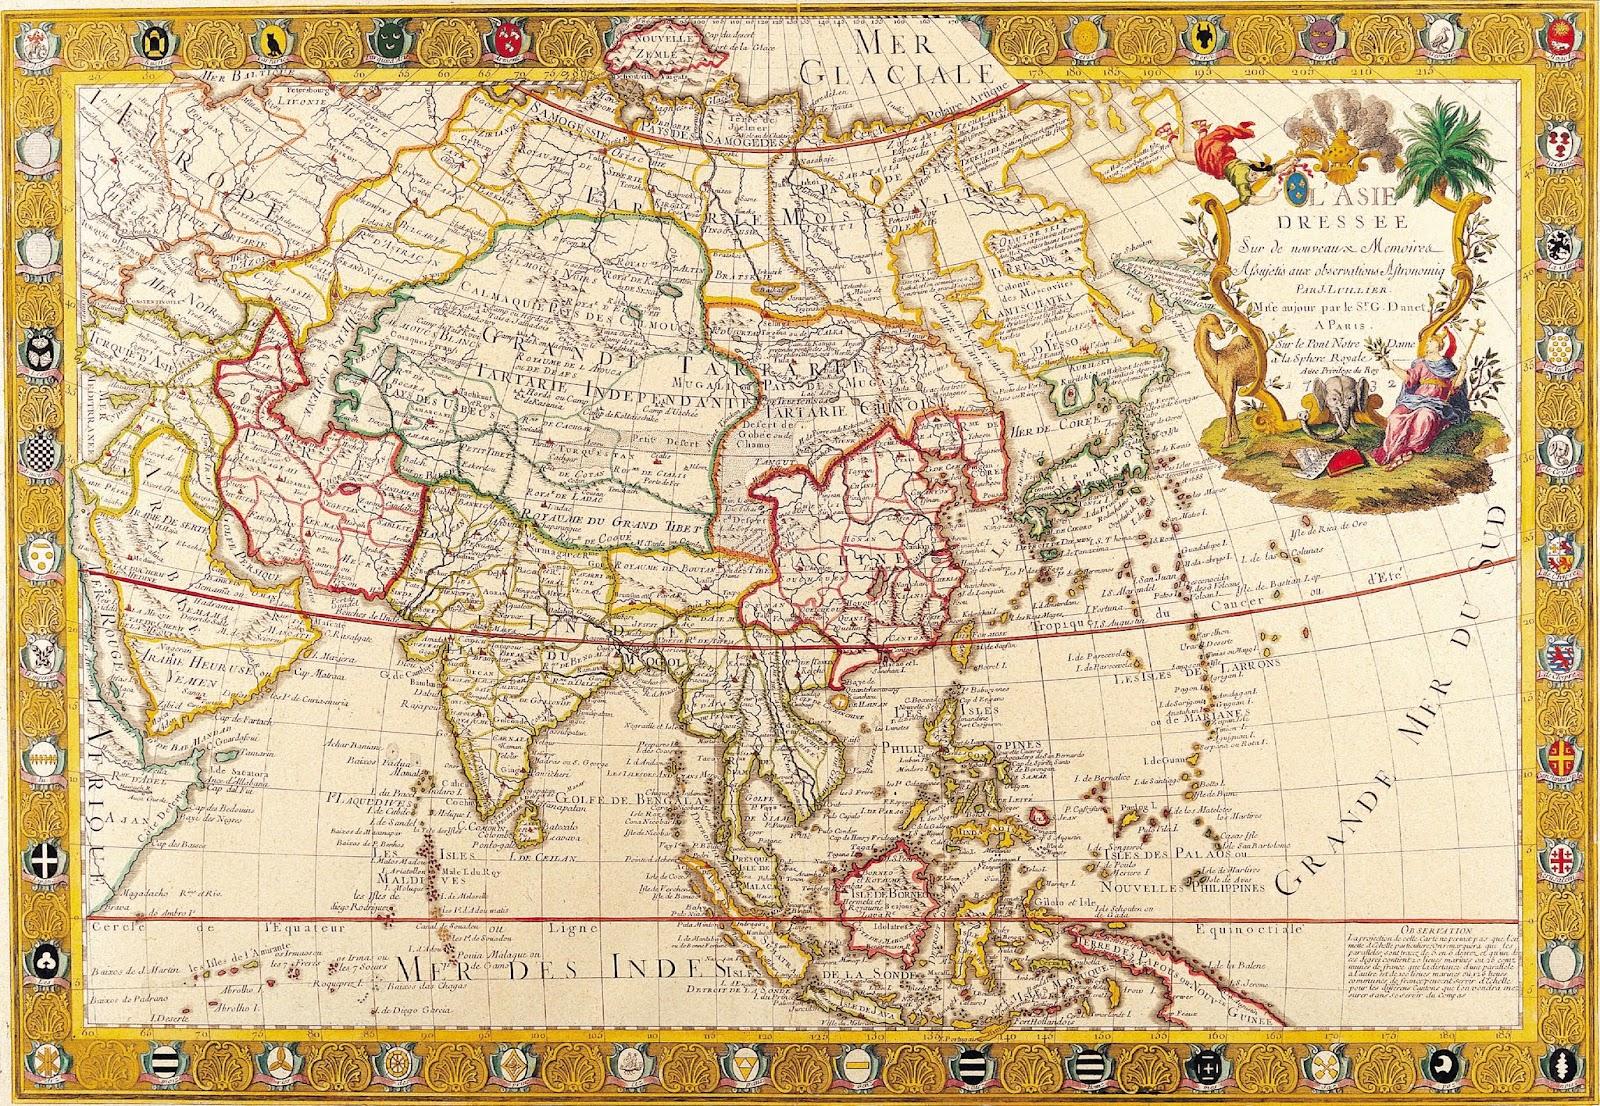 http://3.bp.blogspot.com/-HYYn5Acrw68/UCtLb96rsyI/AAAAAAAAD3Q/8HTM_YwfJgA/s1600/MyEgy.Com.Old.Maps5.By.M.y+%252816%2529.jpg